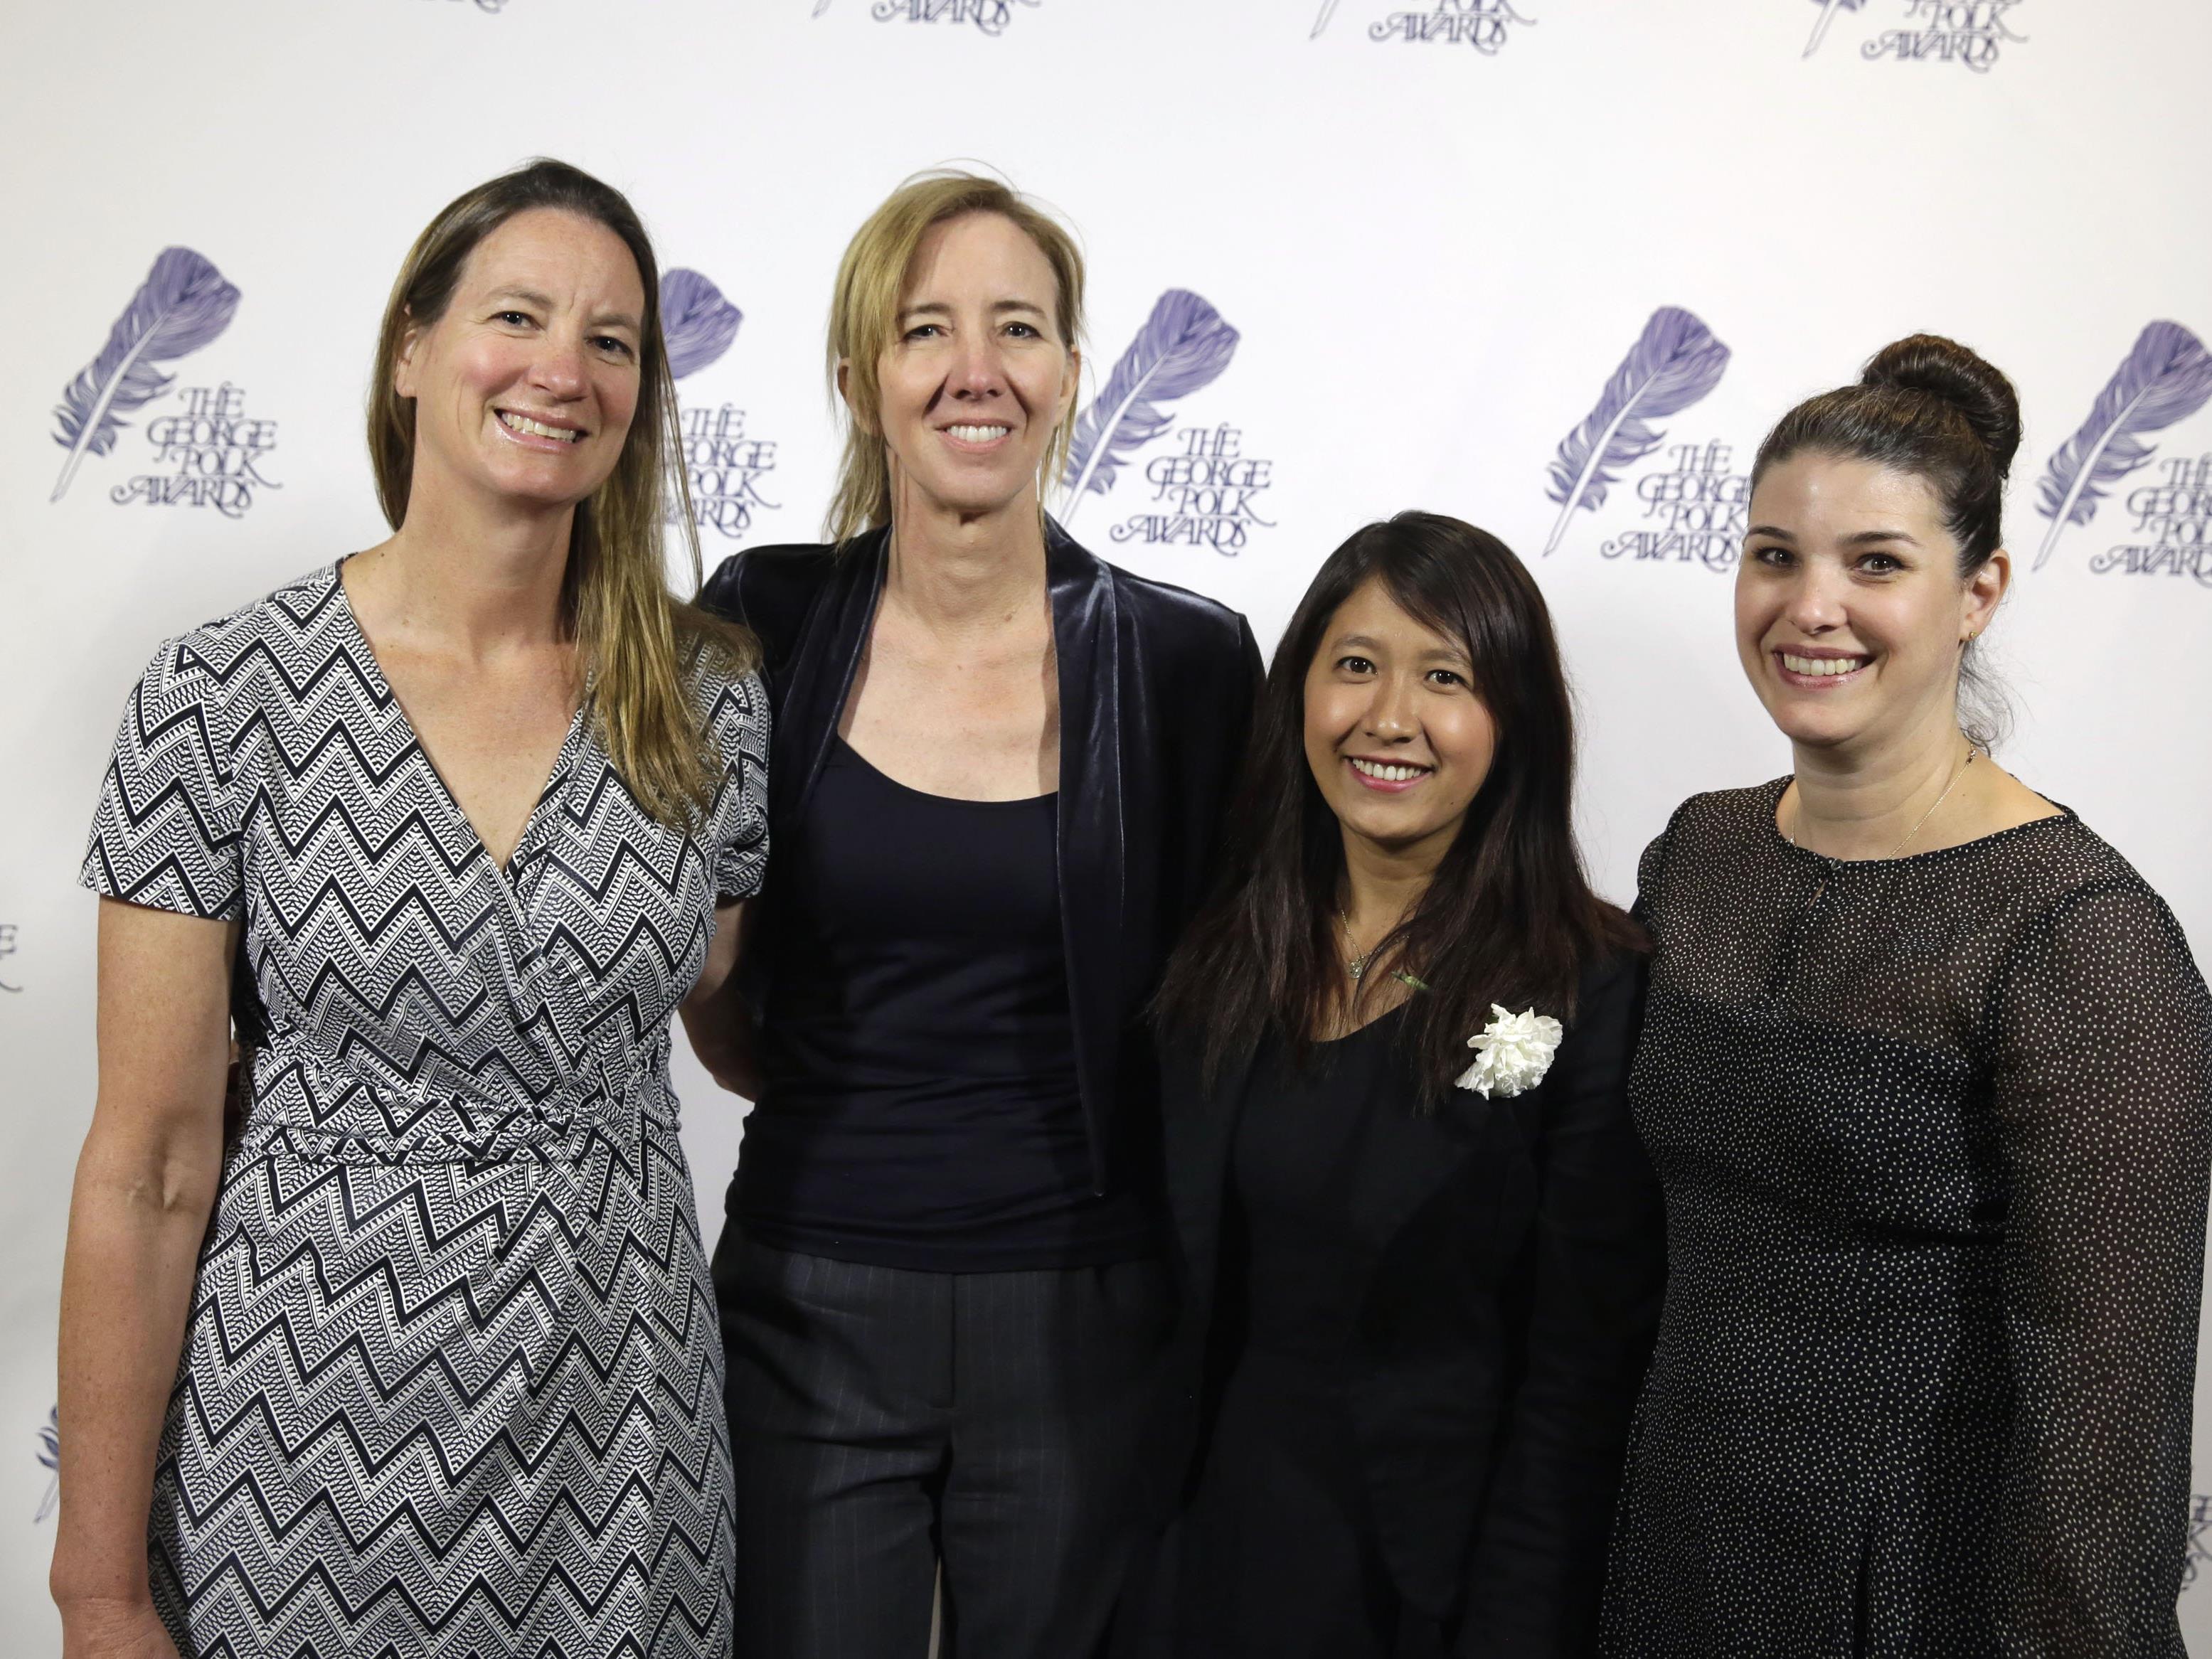 Die AP-Journalistinnen Martha Mendoza, Robin McDowell, Esther Htusan and Margie Mason (v.l.n.r.)